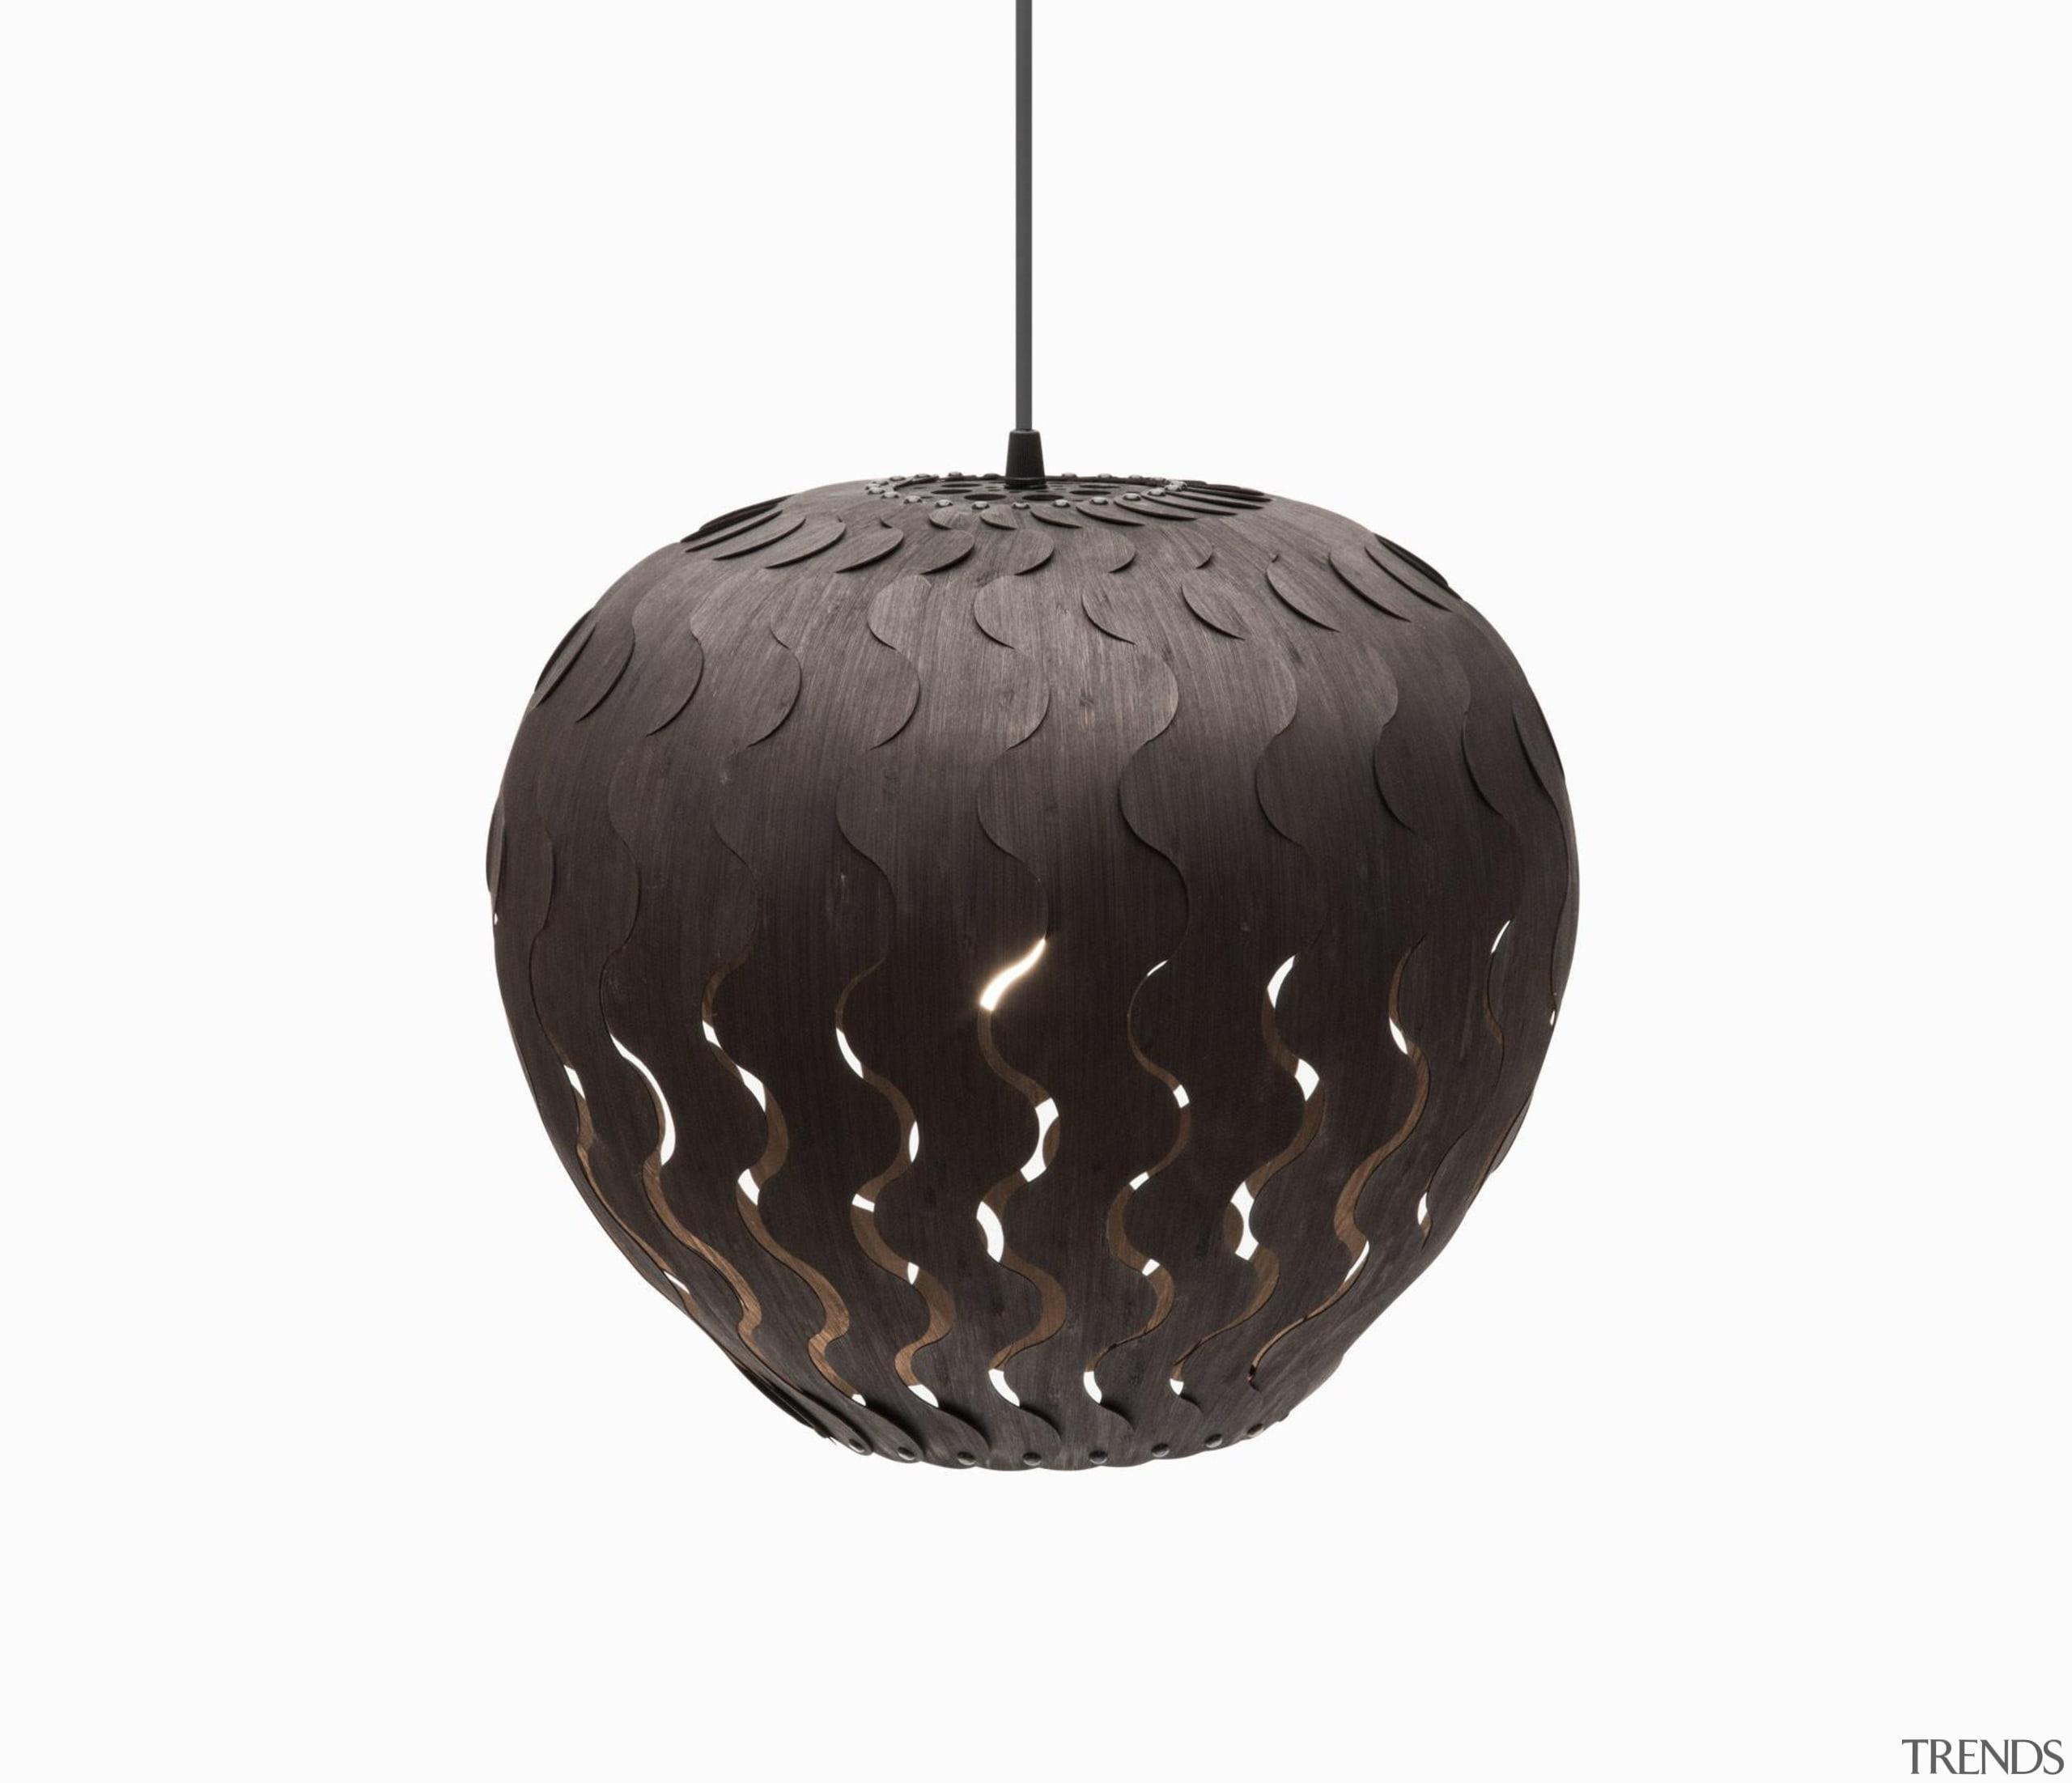 These arresting lights by designer David Trubridge make ceiling fixture, lamp, light fixture, lighting, product design, white